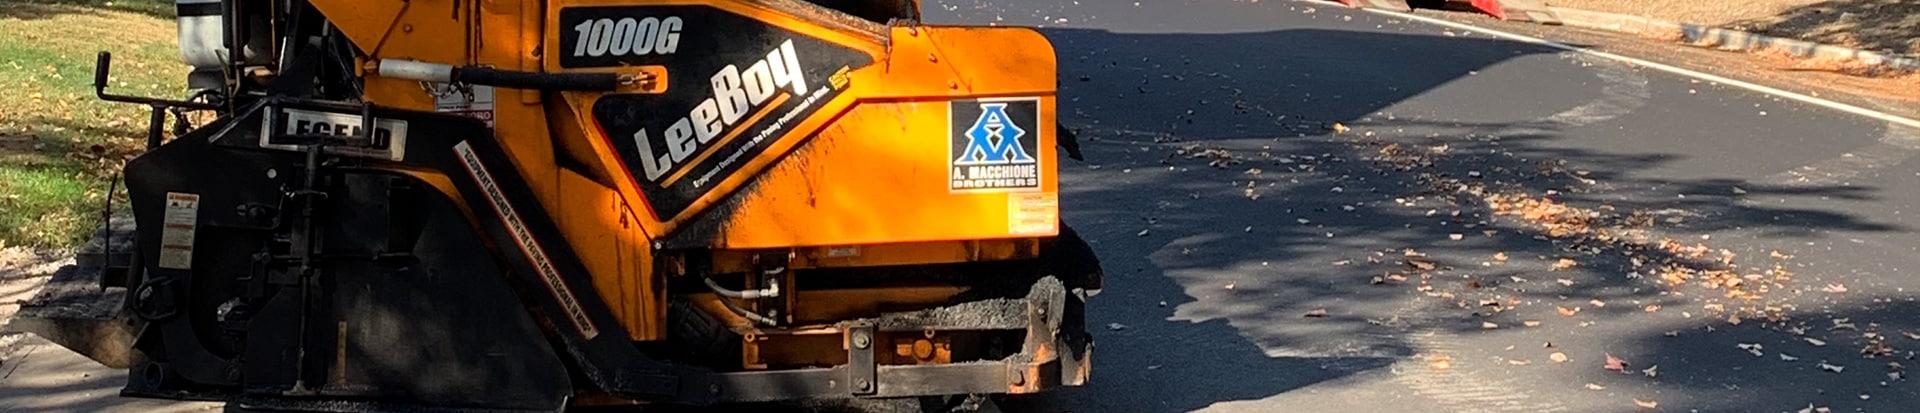 leeboy asphalt paver